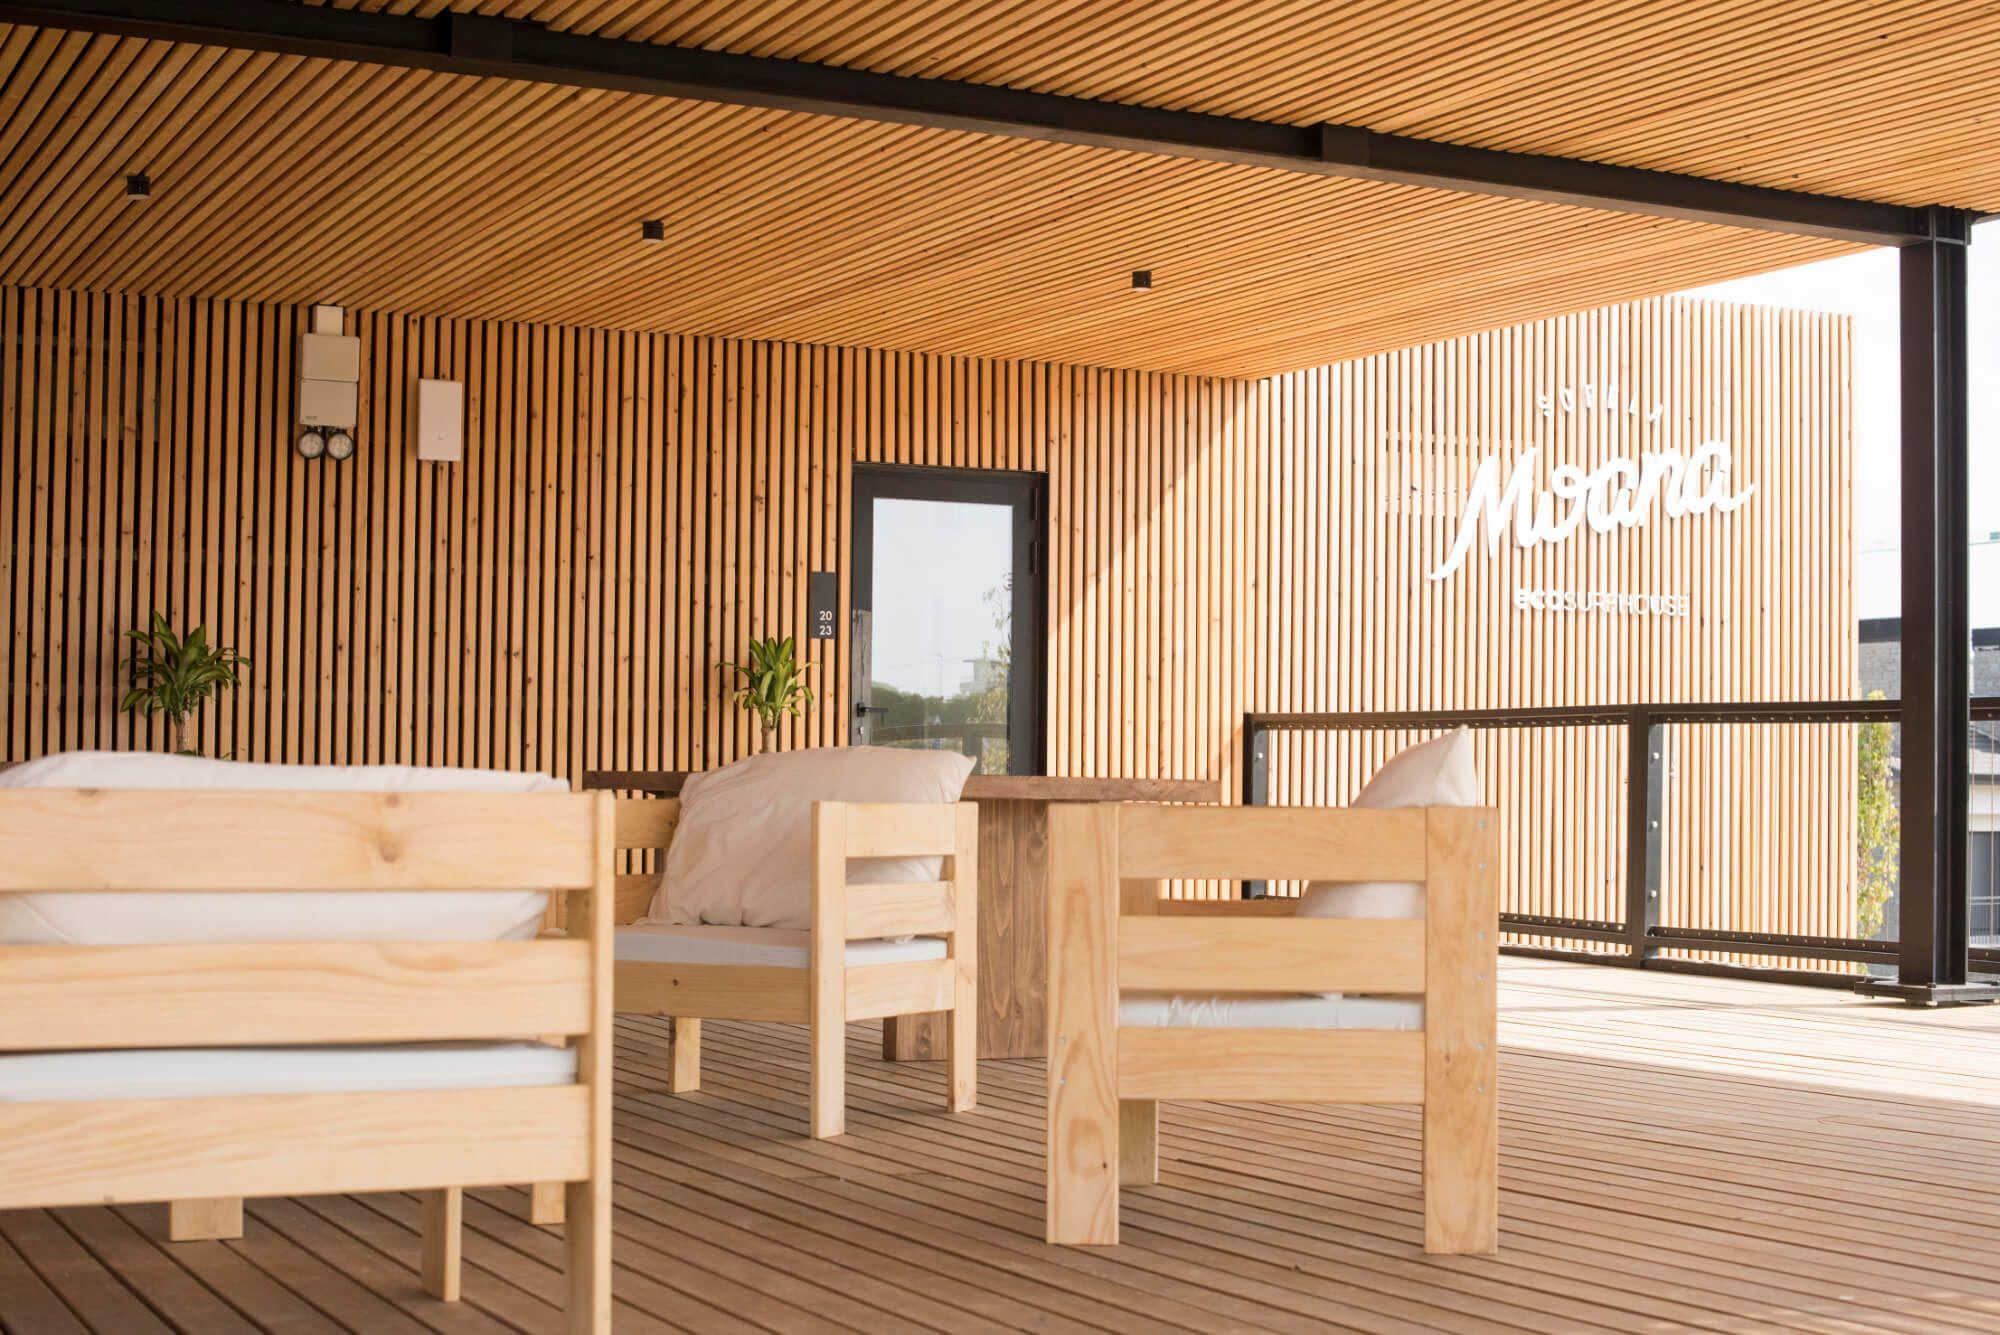 Salón Exterior Moana Surf Hostel Sopelana País Vasco